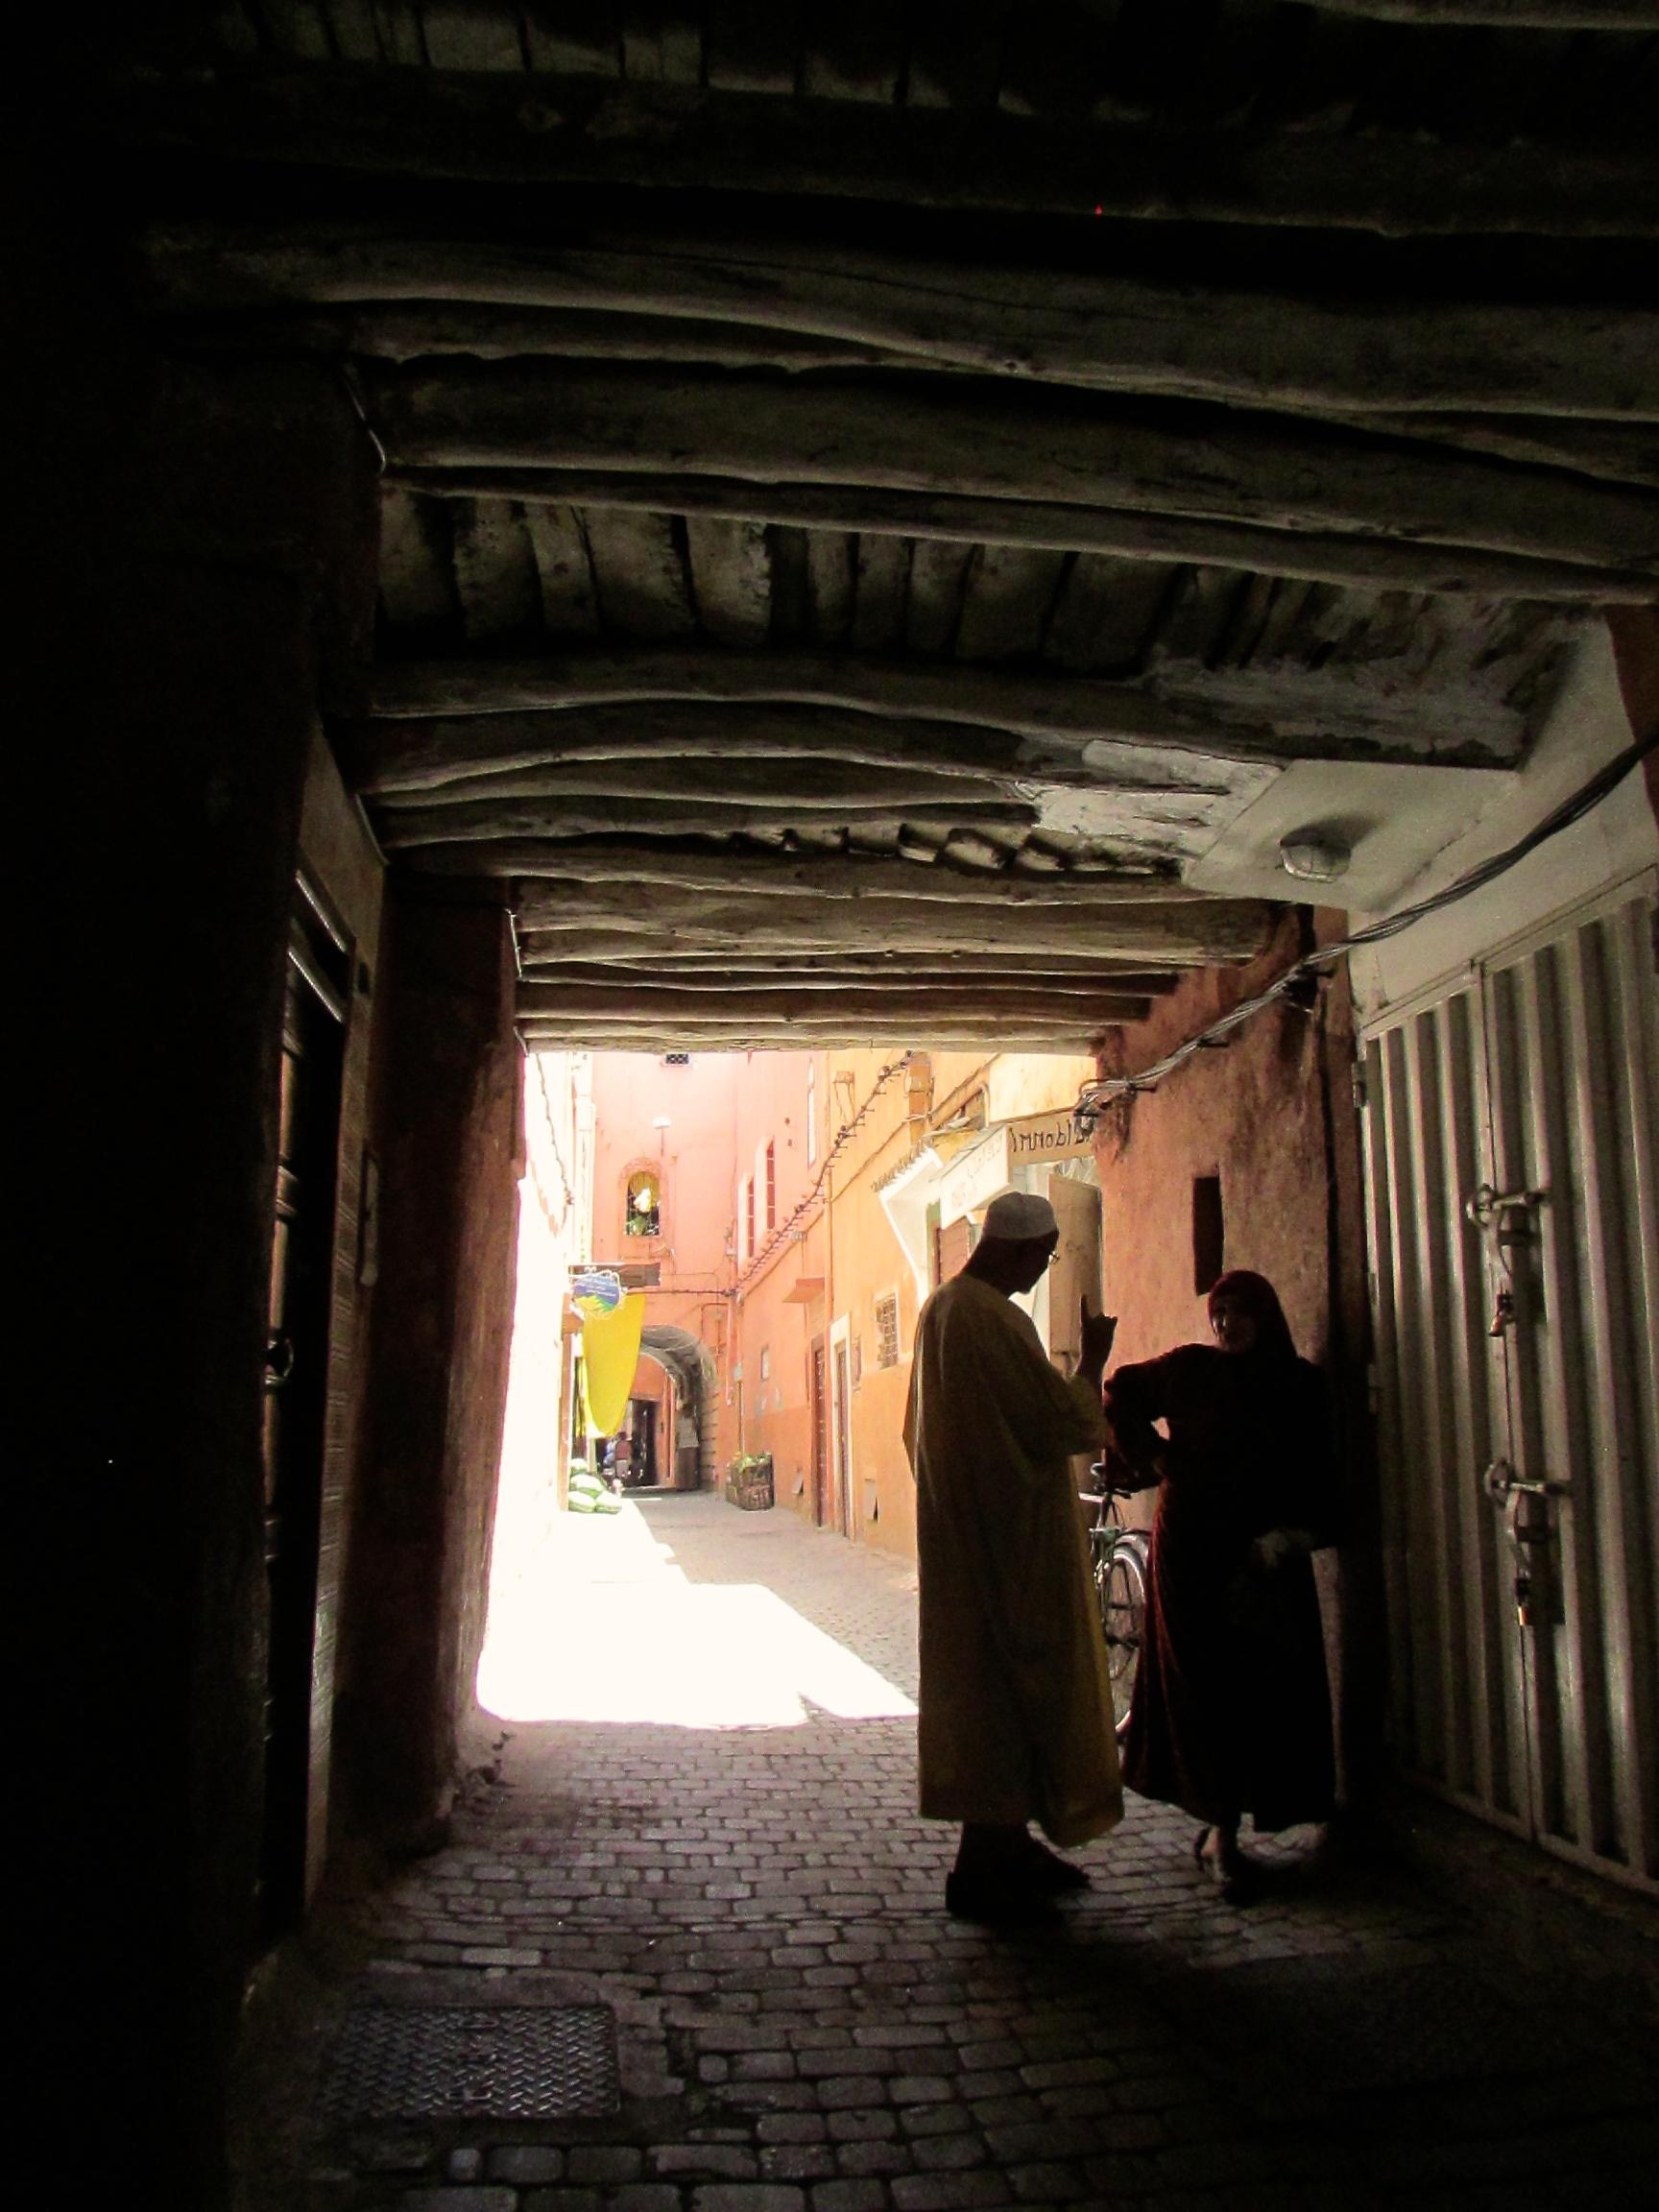 A street in the medina in Marrakesh, Morocco